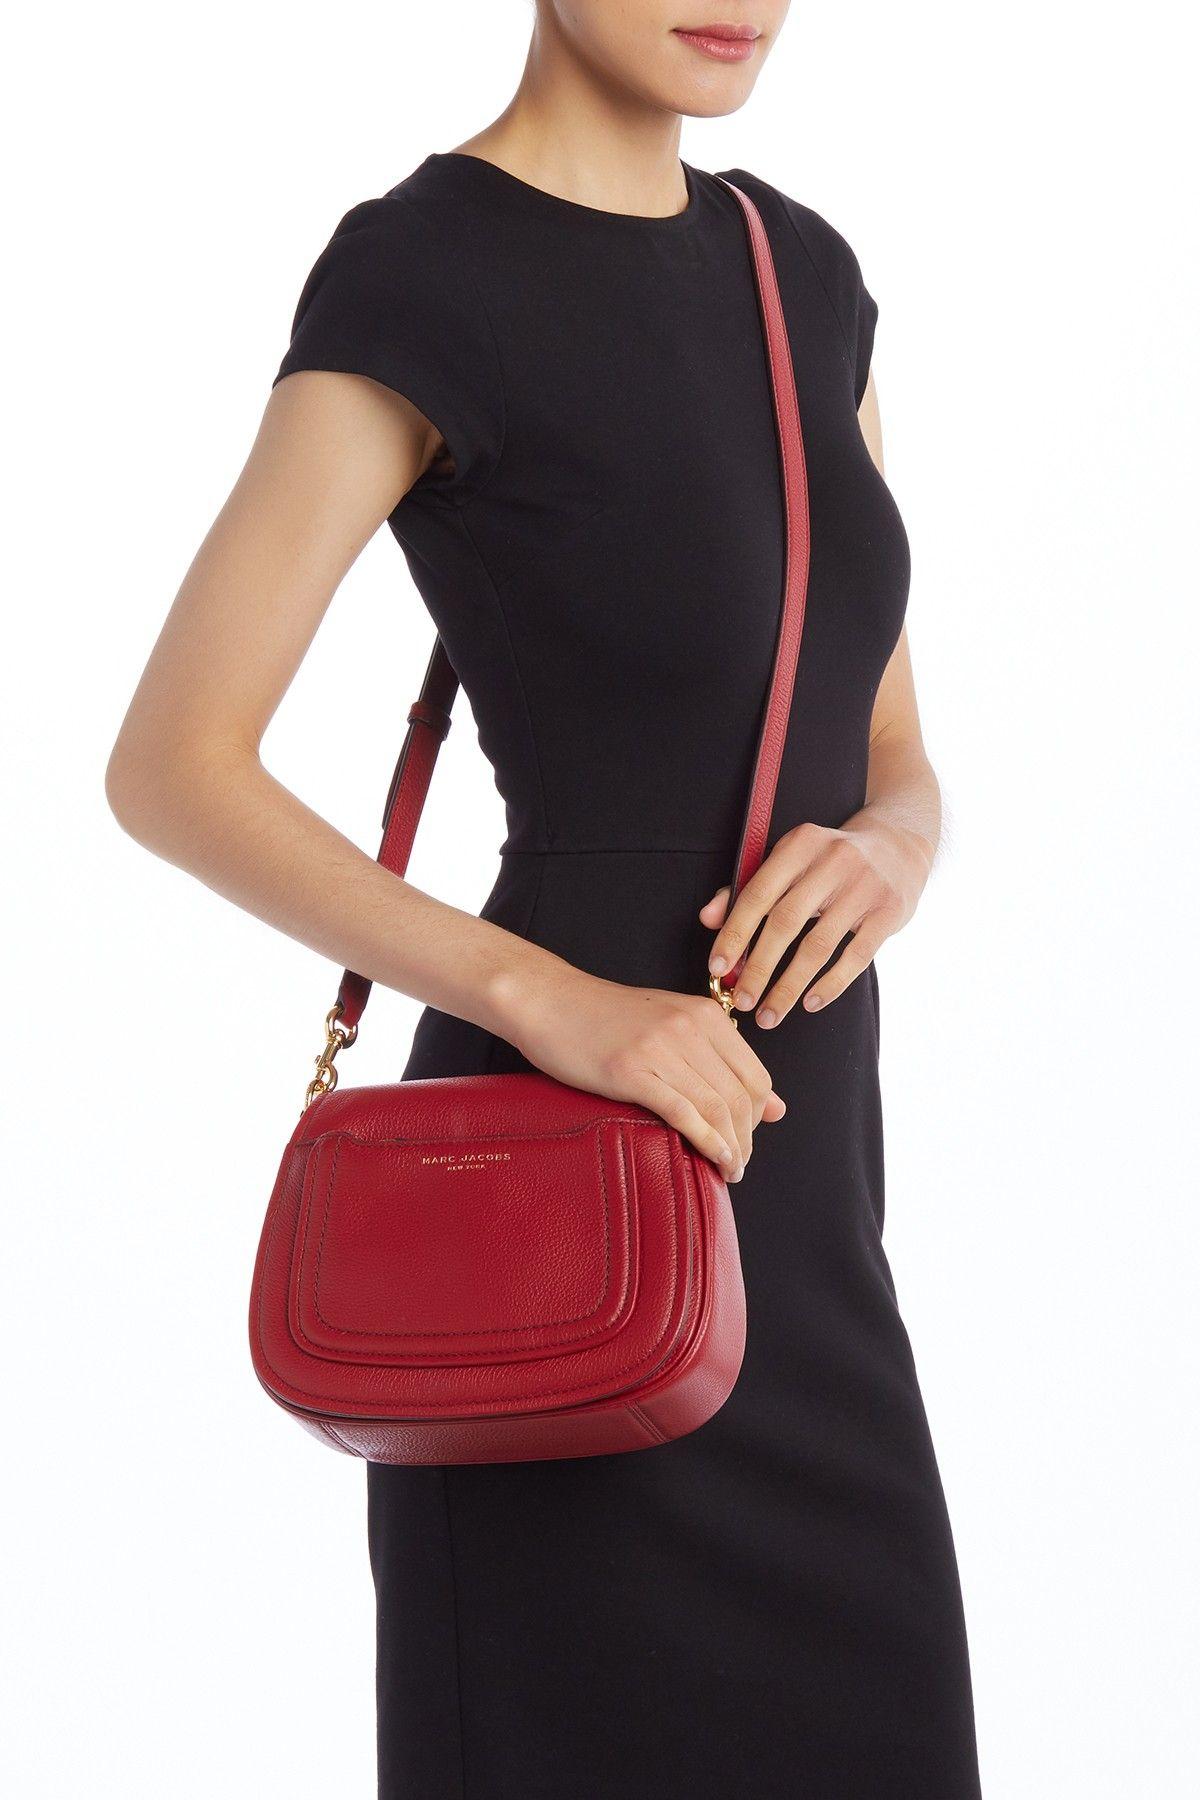 1ca952c9daea Image of Marc Jacobs Empire City Mini Messenger Leather Crossbody Bag